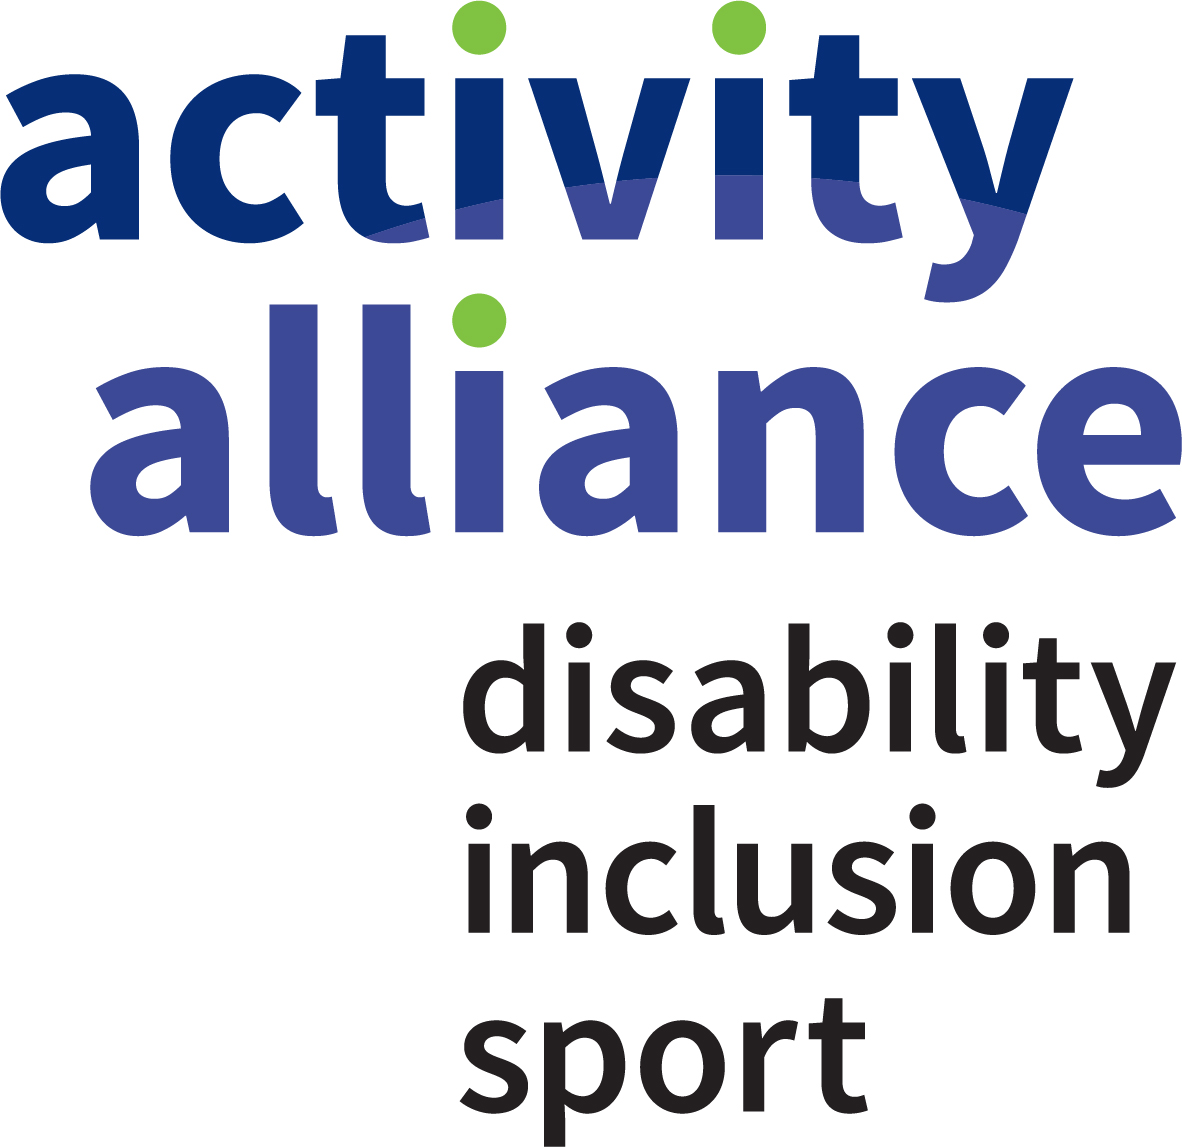 https://www.merseysidesport.com/wp-content/uploads/2018/06/Activity-Alliance-Logo_Strap_RGB.jpg